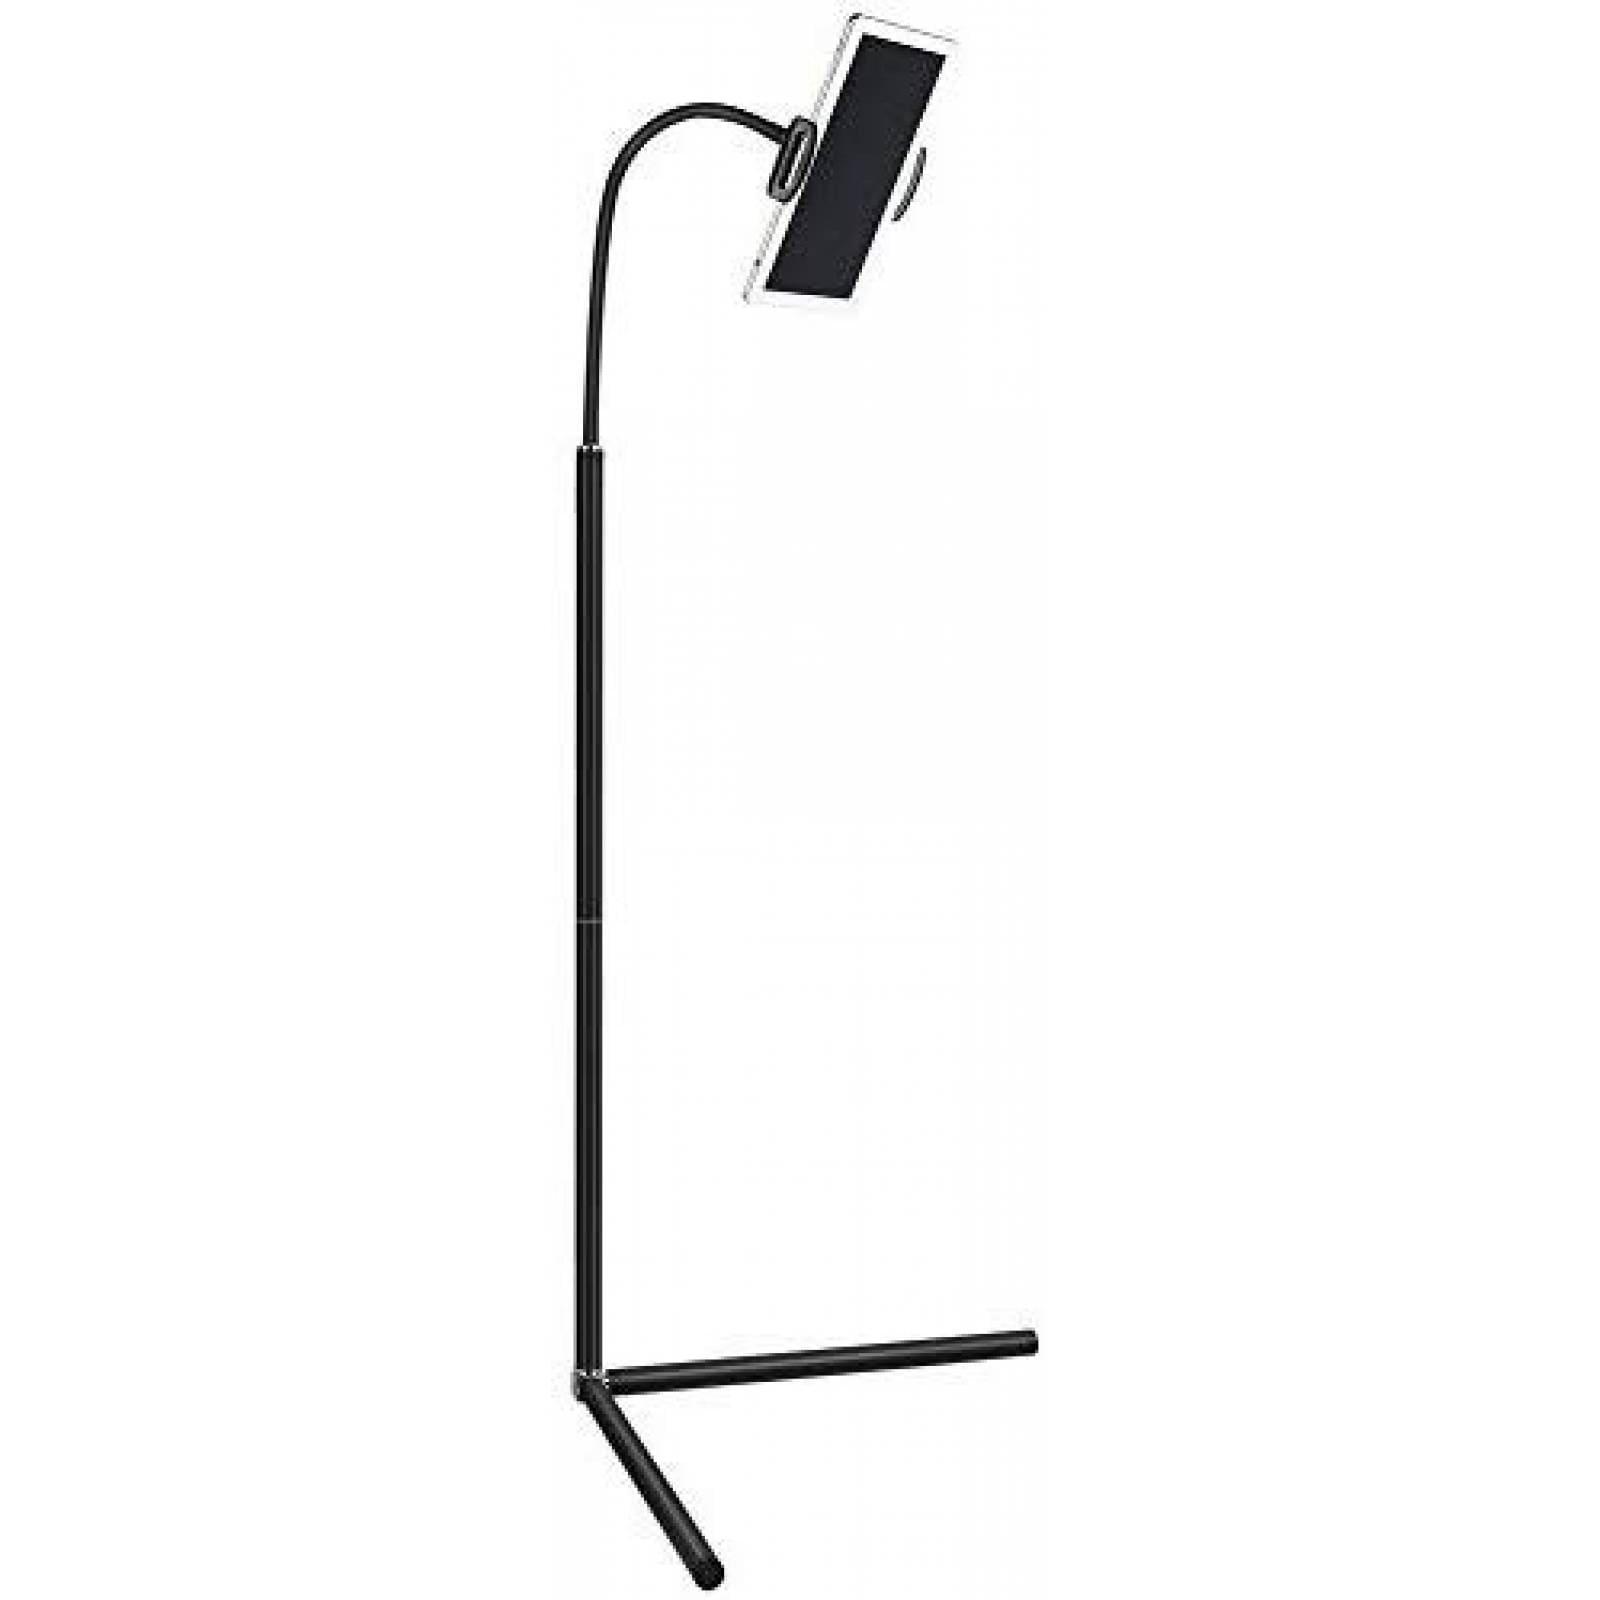 Soporte de pie Anyike p/tablet altura ajustable 360° -Negro